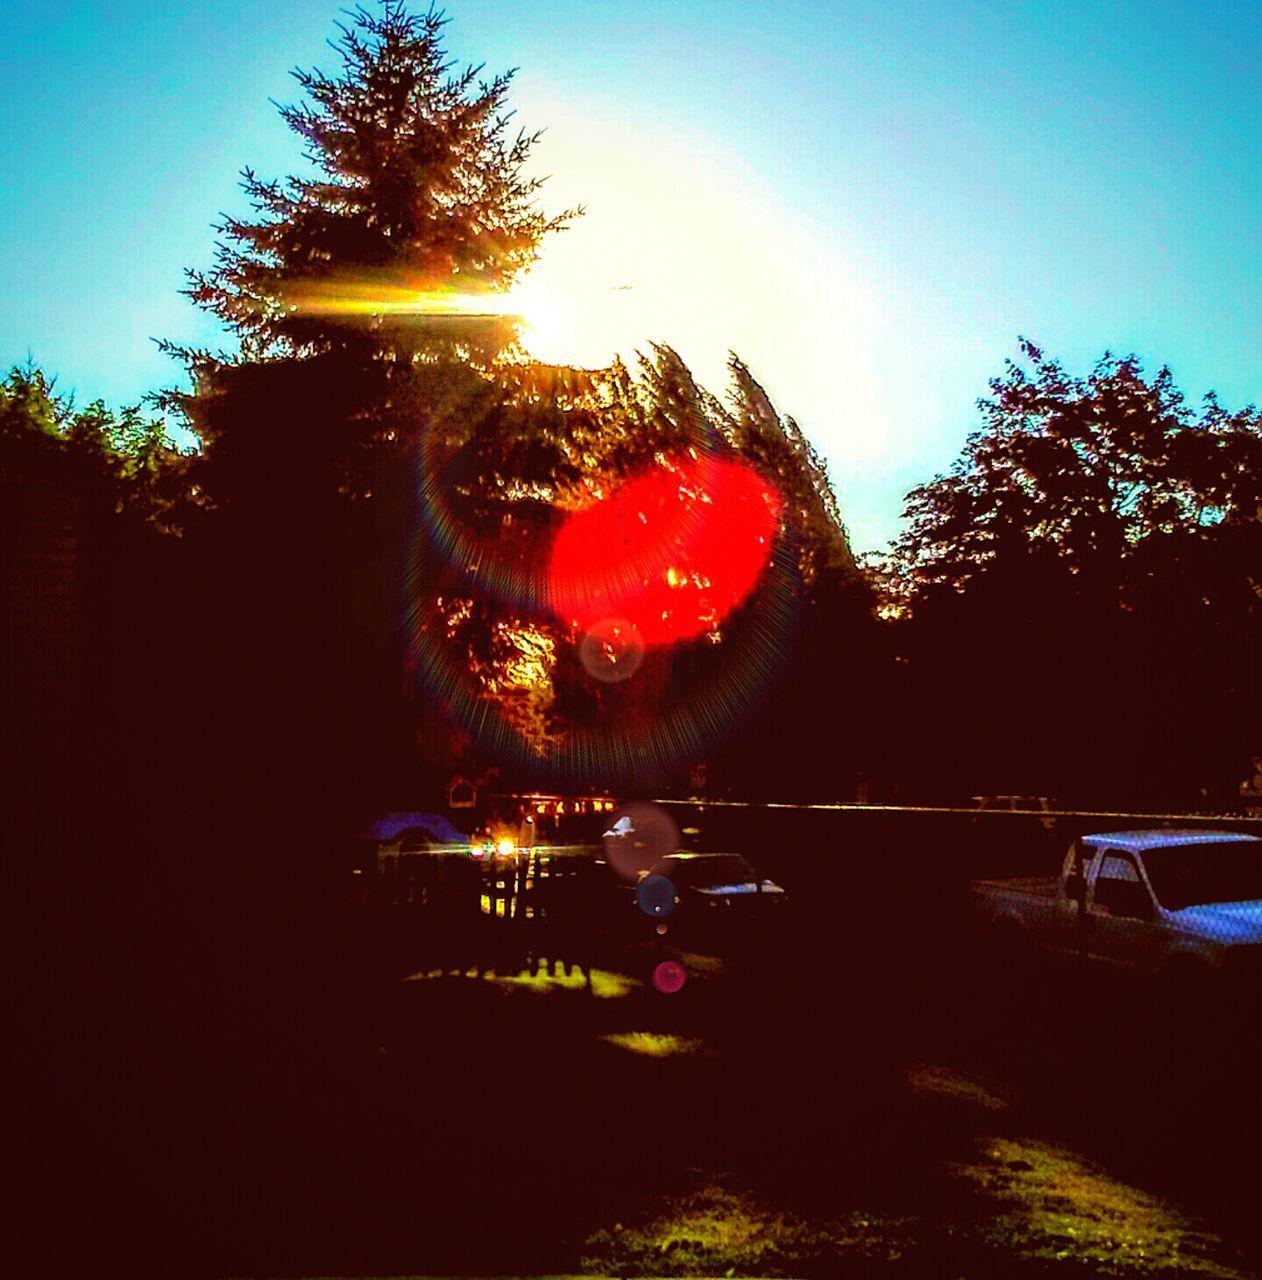 tree, car, sunset, speed, illuminated, transportation, outdoors, no people, sky, land vehicle, night, nature